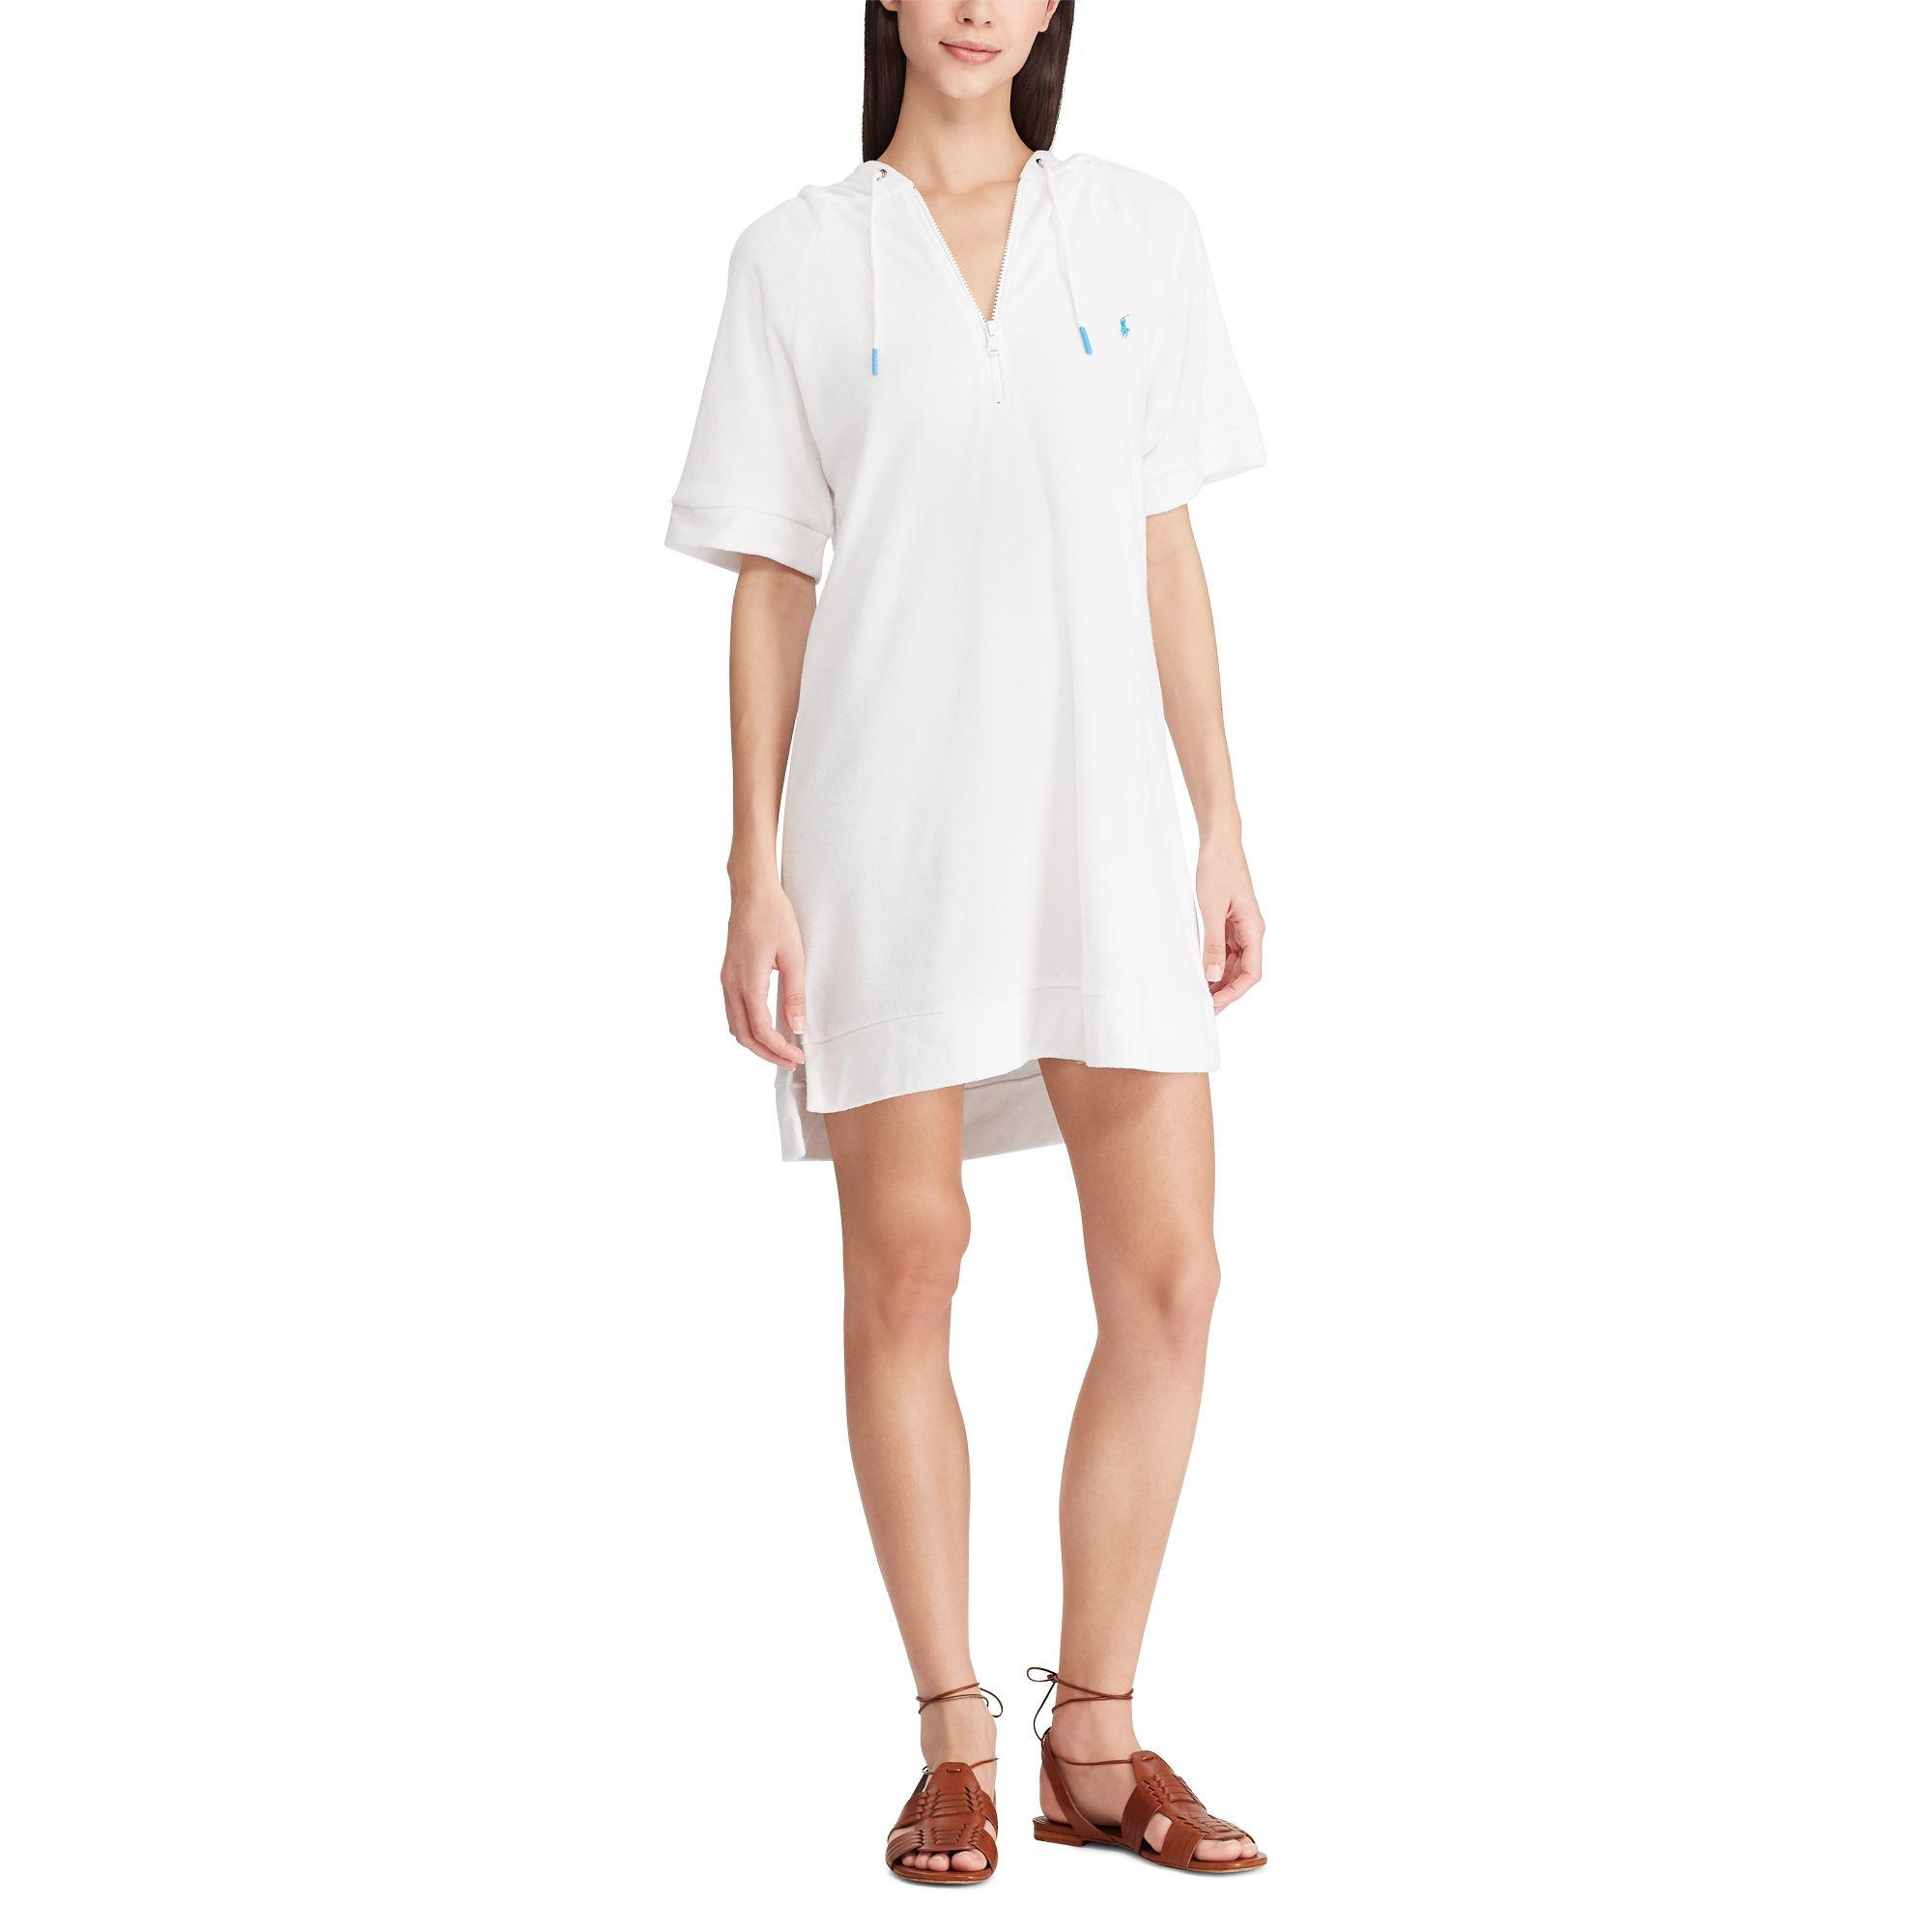 9c63ebeaaeda2 Lyst - Polo Ralph Lauren French Terry Hoodie Dress in White